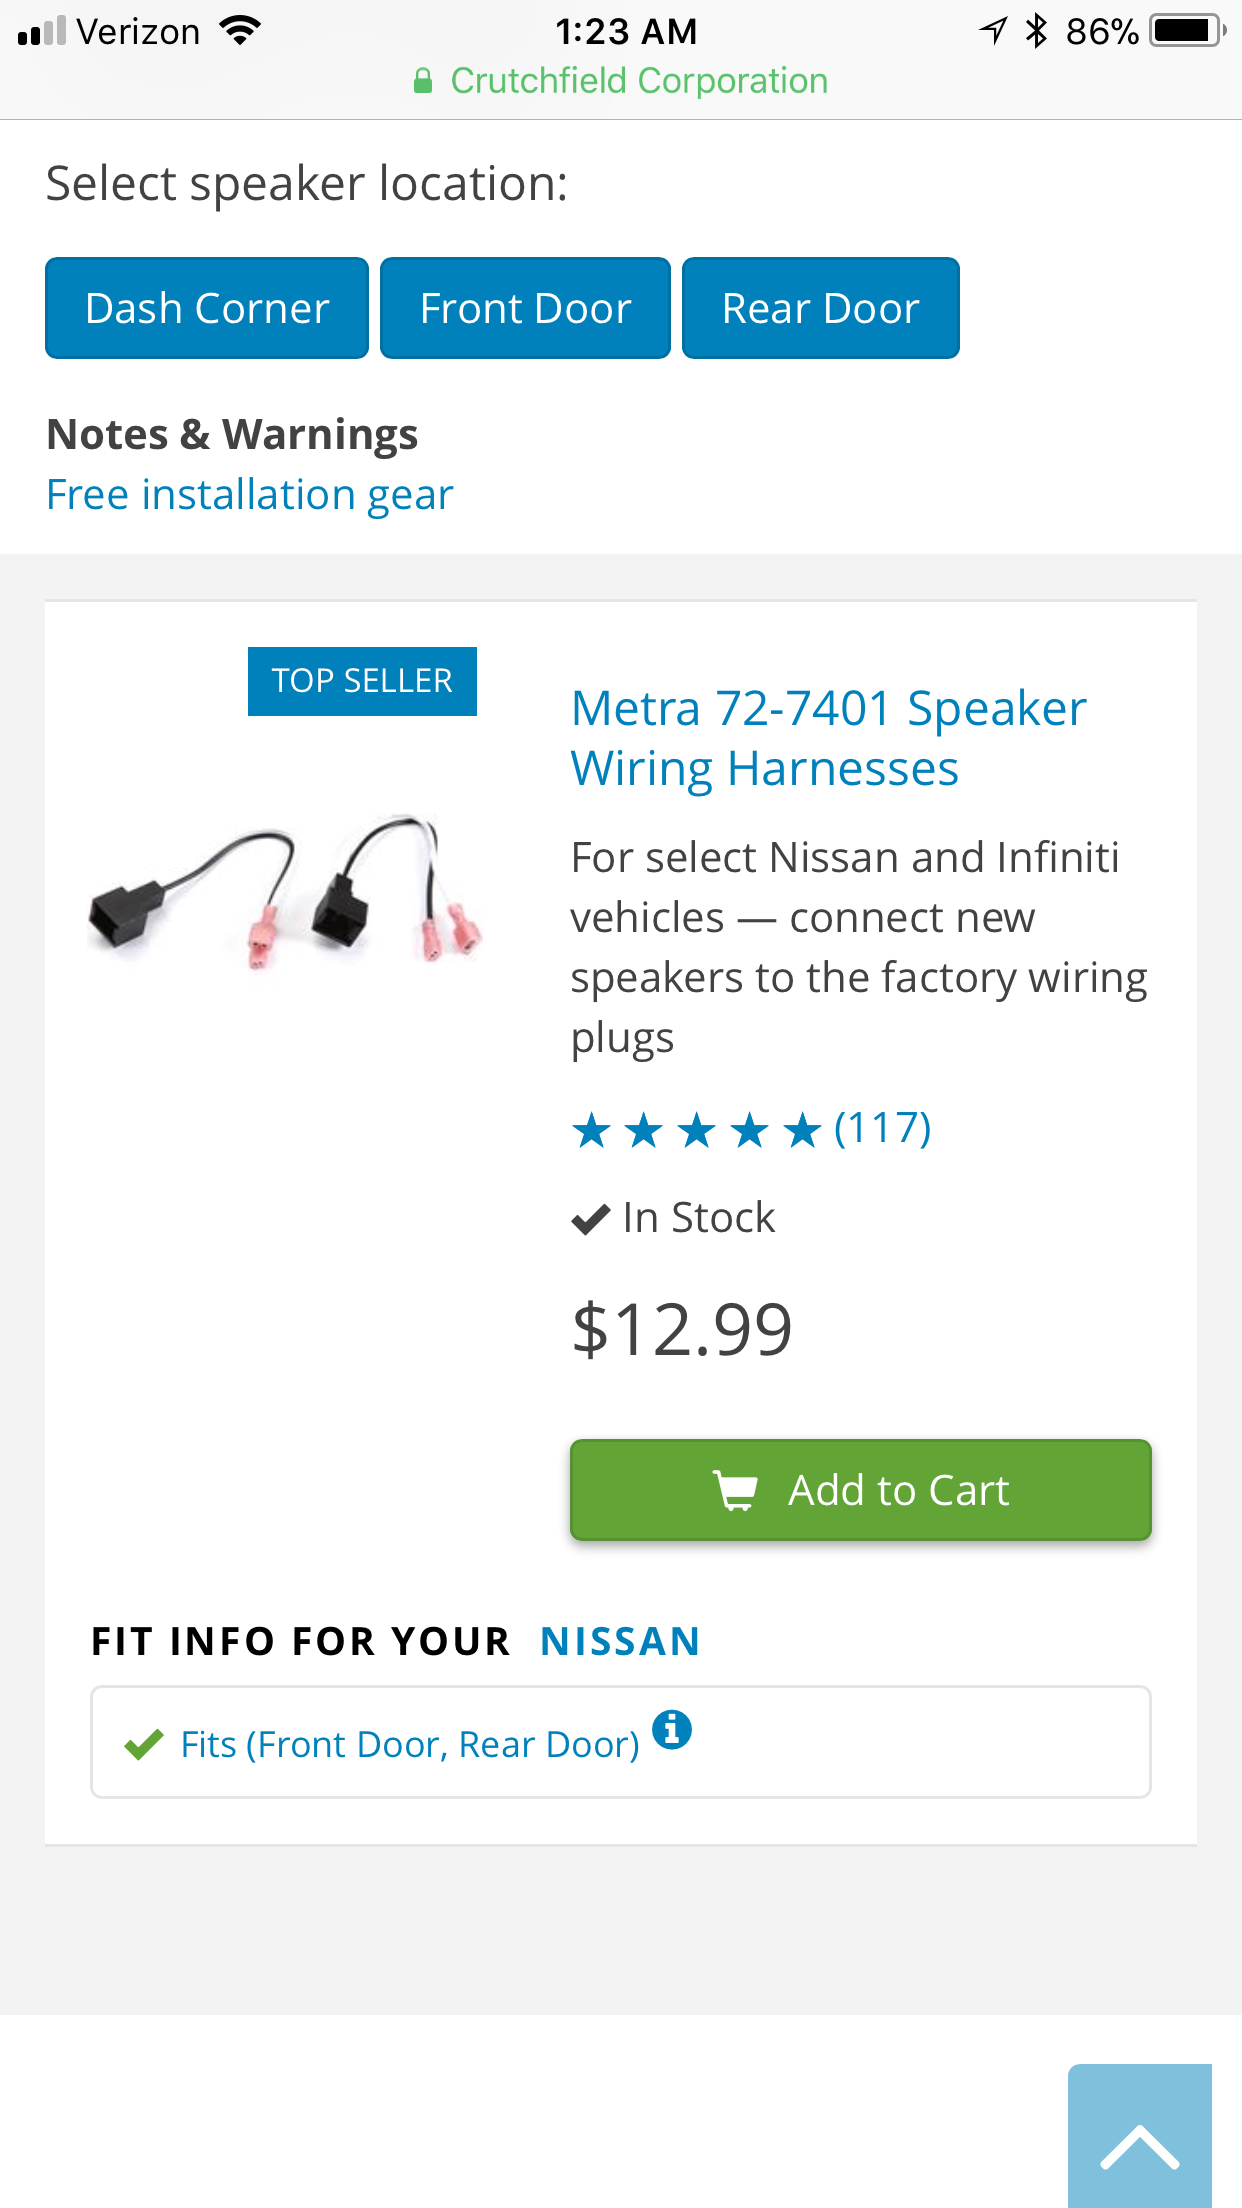 2017 Nissan Titan Factory Speakers Replacement Forum Offroad Light Wiring 39s A06c5fbc B6c0 49f0 9a69 84baea2e26b4 1518341119306